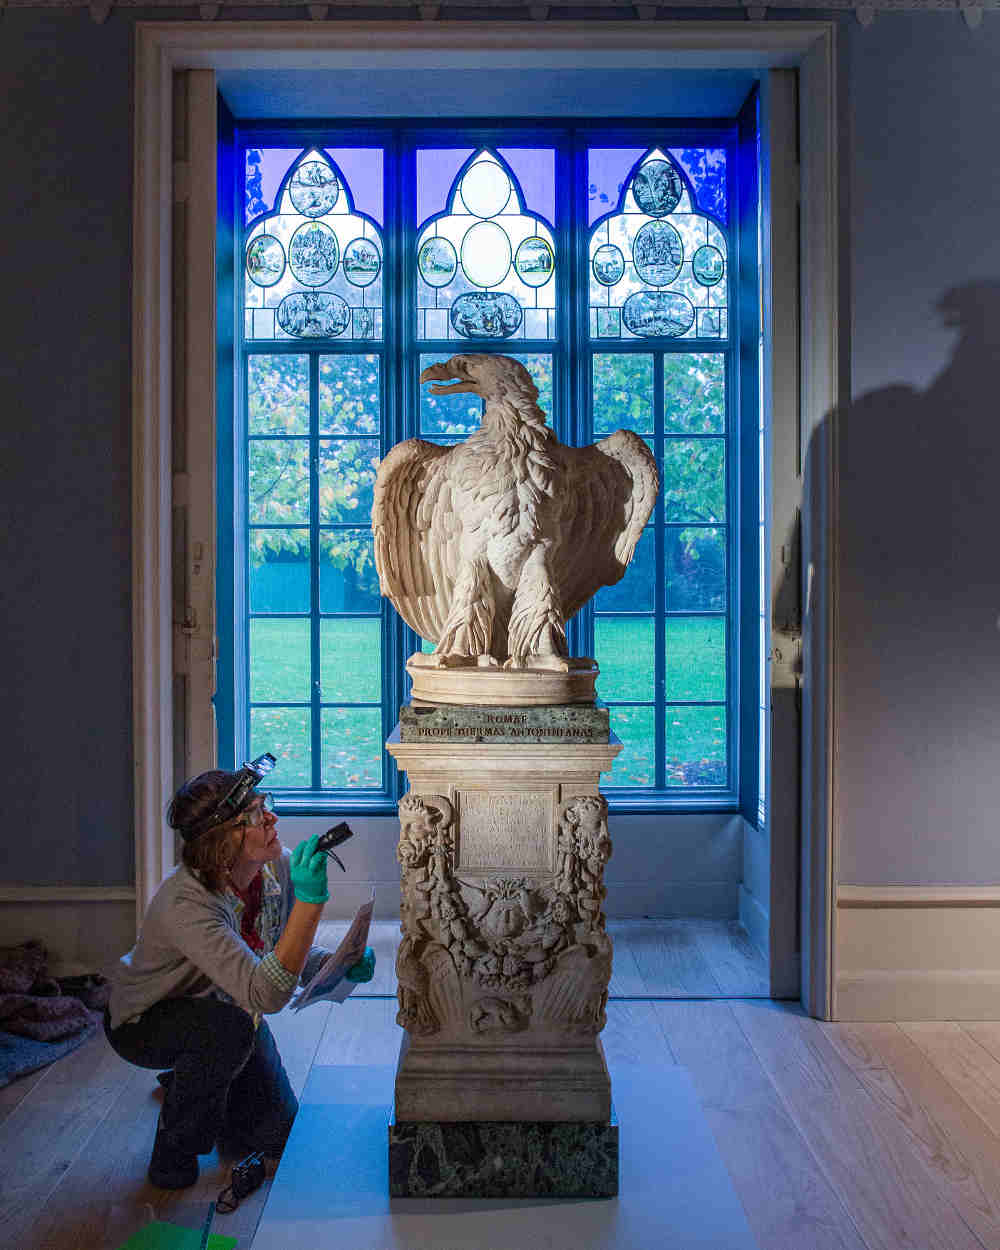 Lost Treasures of Strawberry Hill, Eagle, Horace Walpole, Anne Seymour Damer